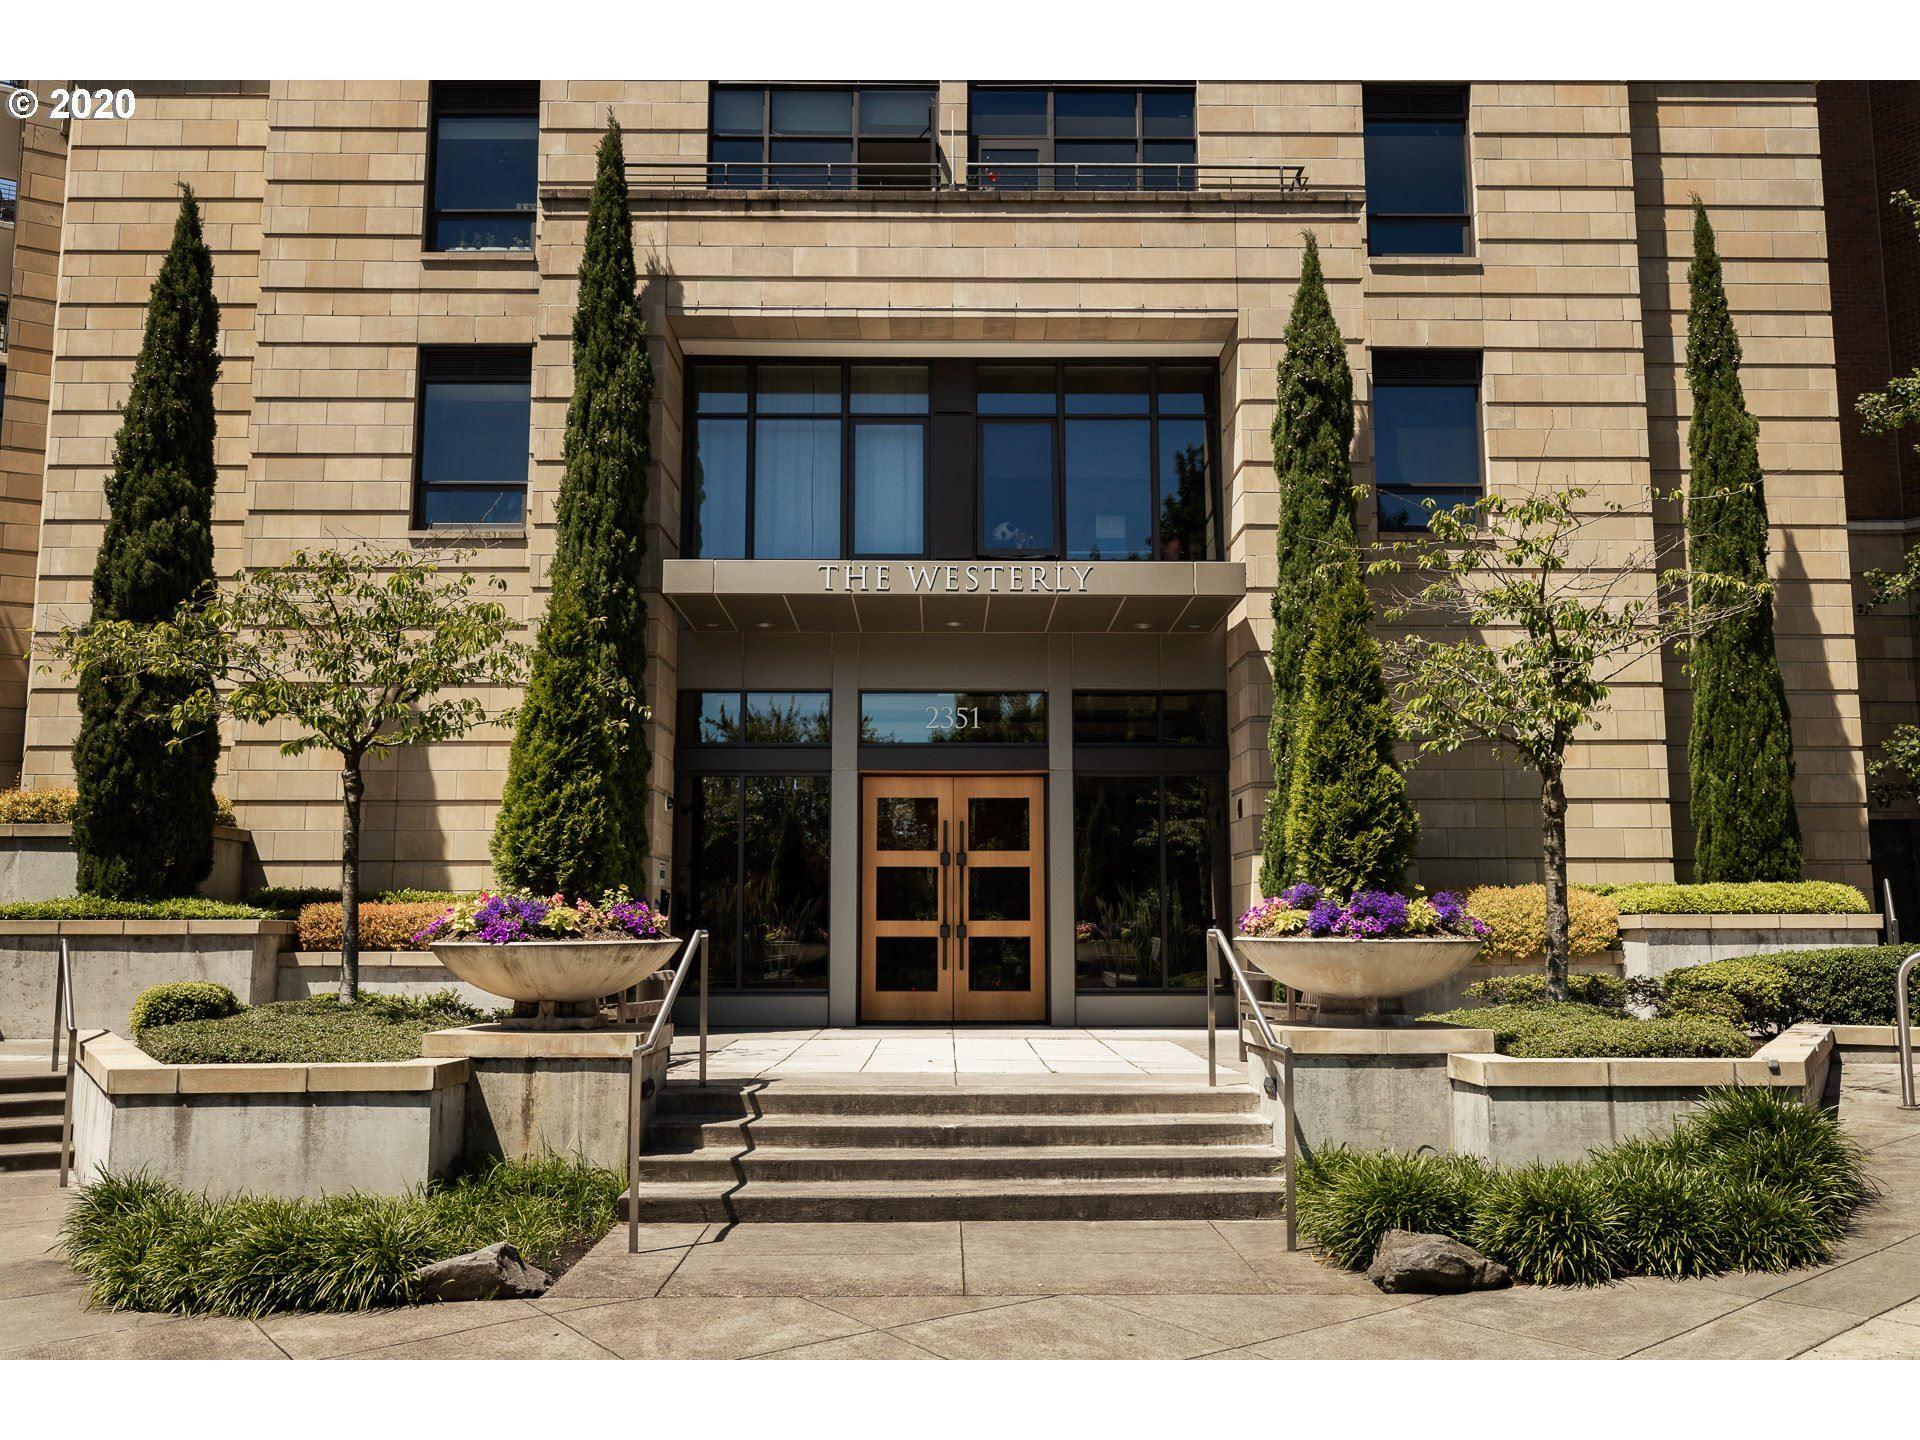 2351 NW WESTOVER RD #309, Portland, OR 97210 - MLS#: 20596584